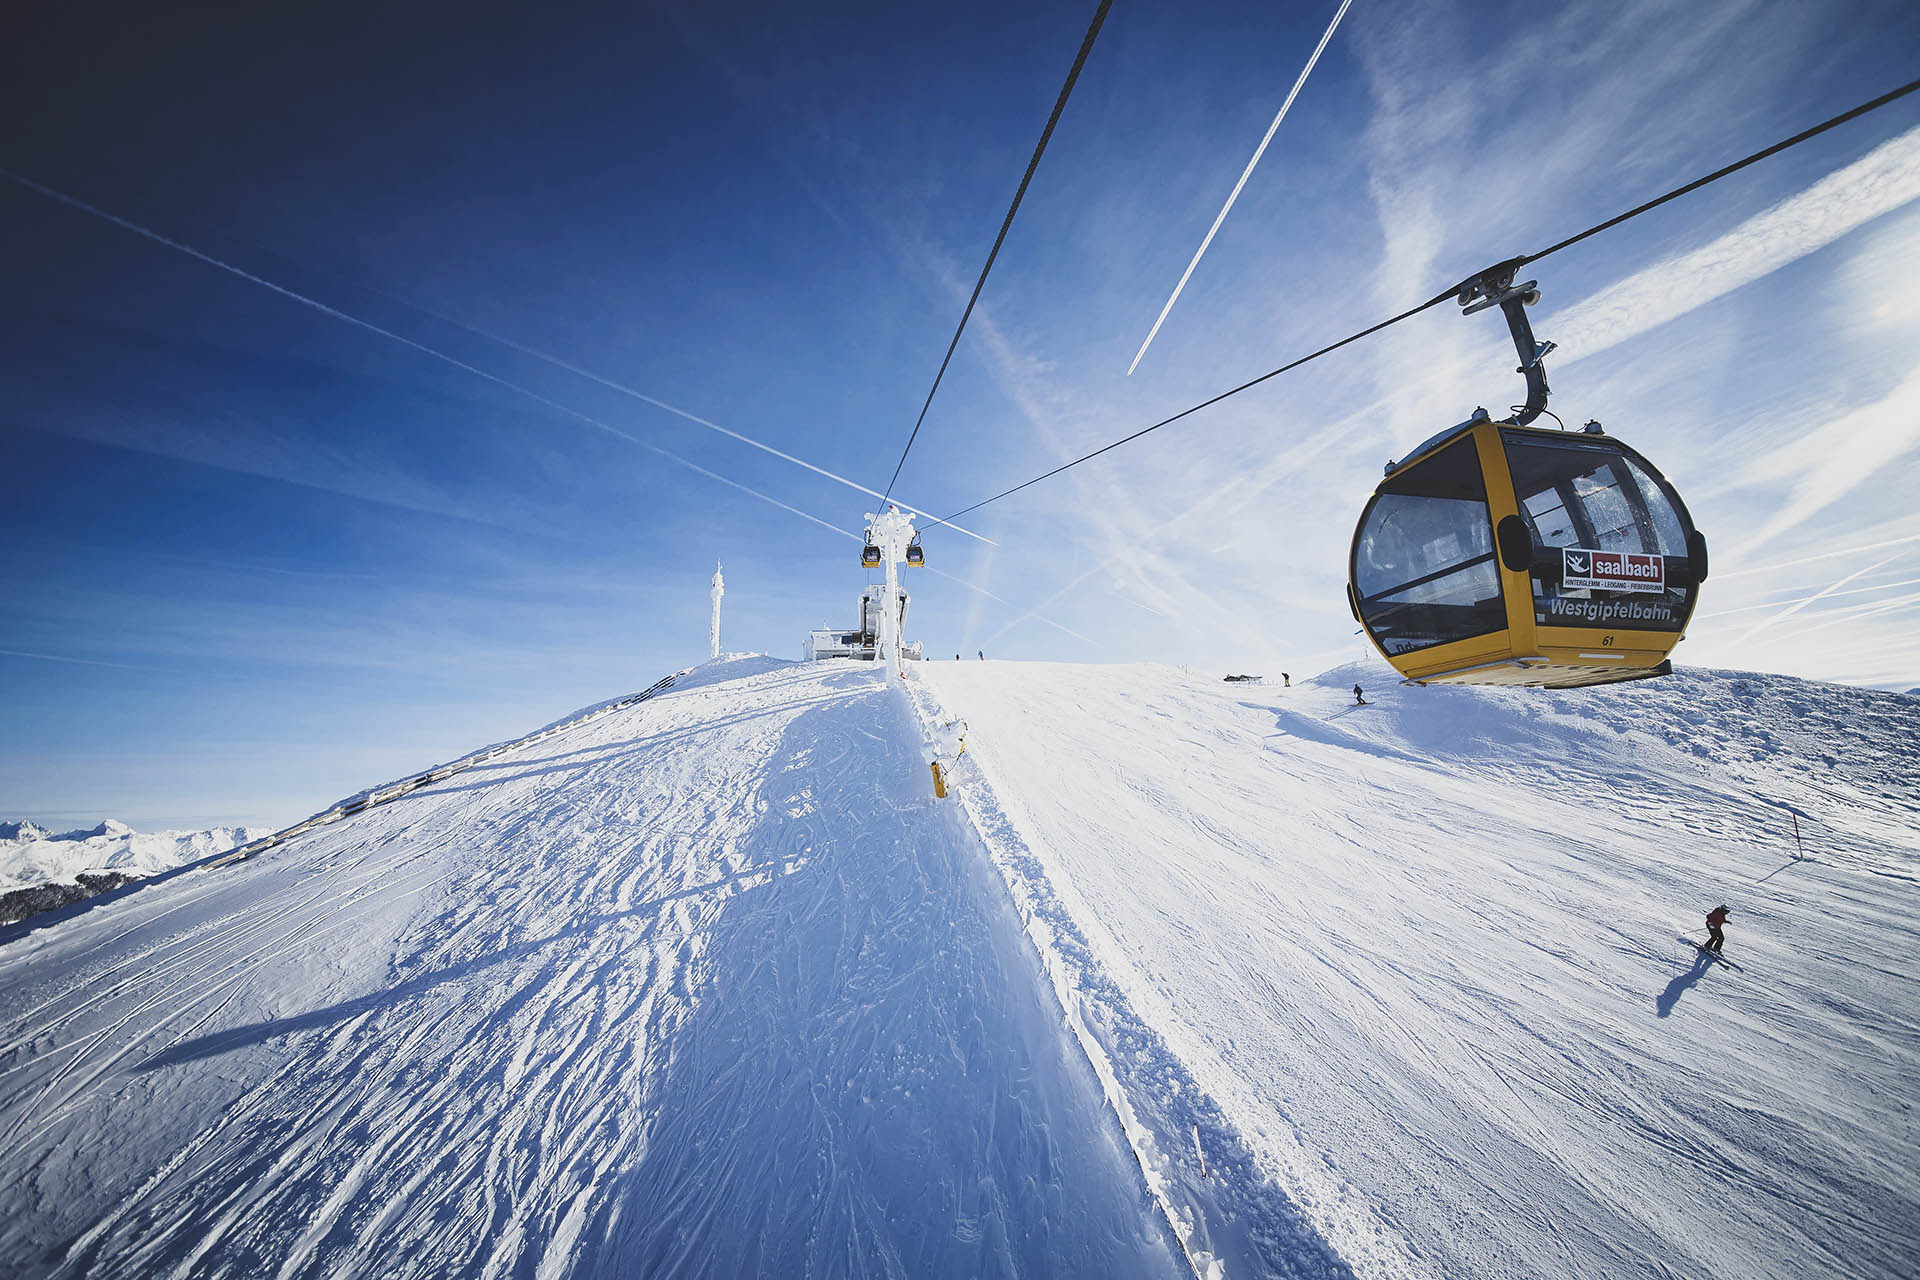 HolidayFlats24-Skifahren in Saalbach Hinterglemm- Westgipfelbahn